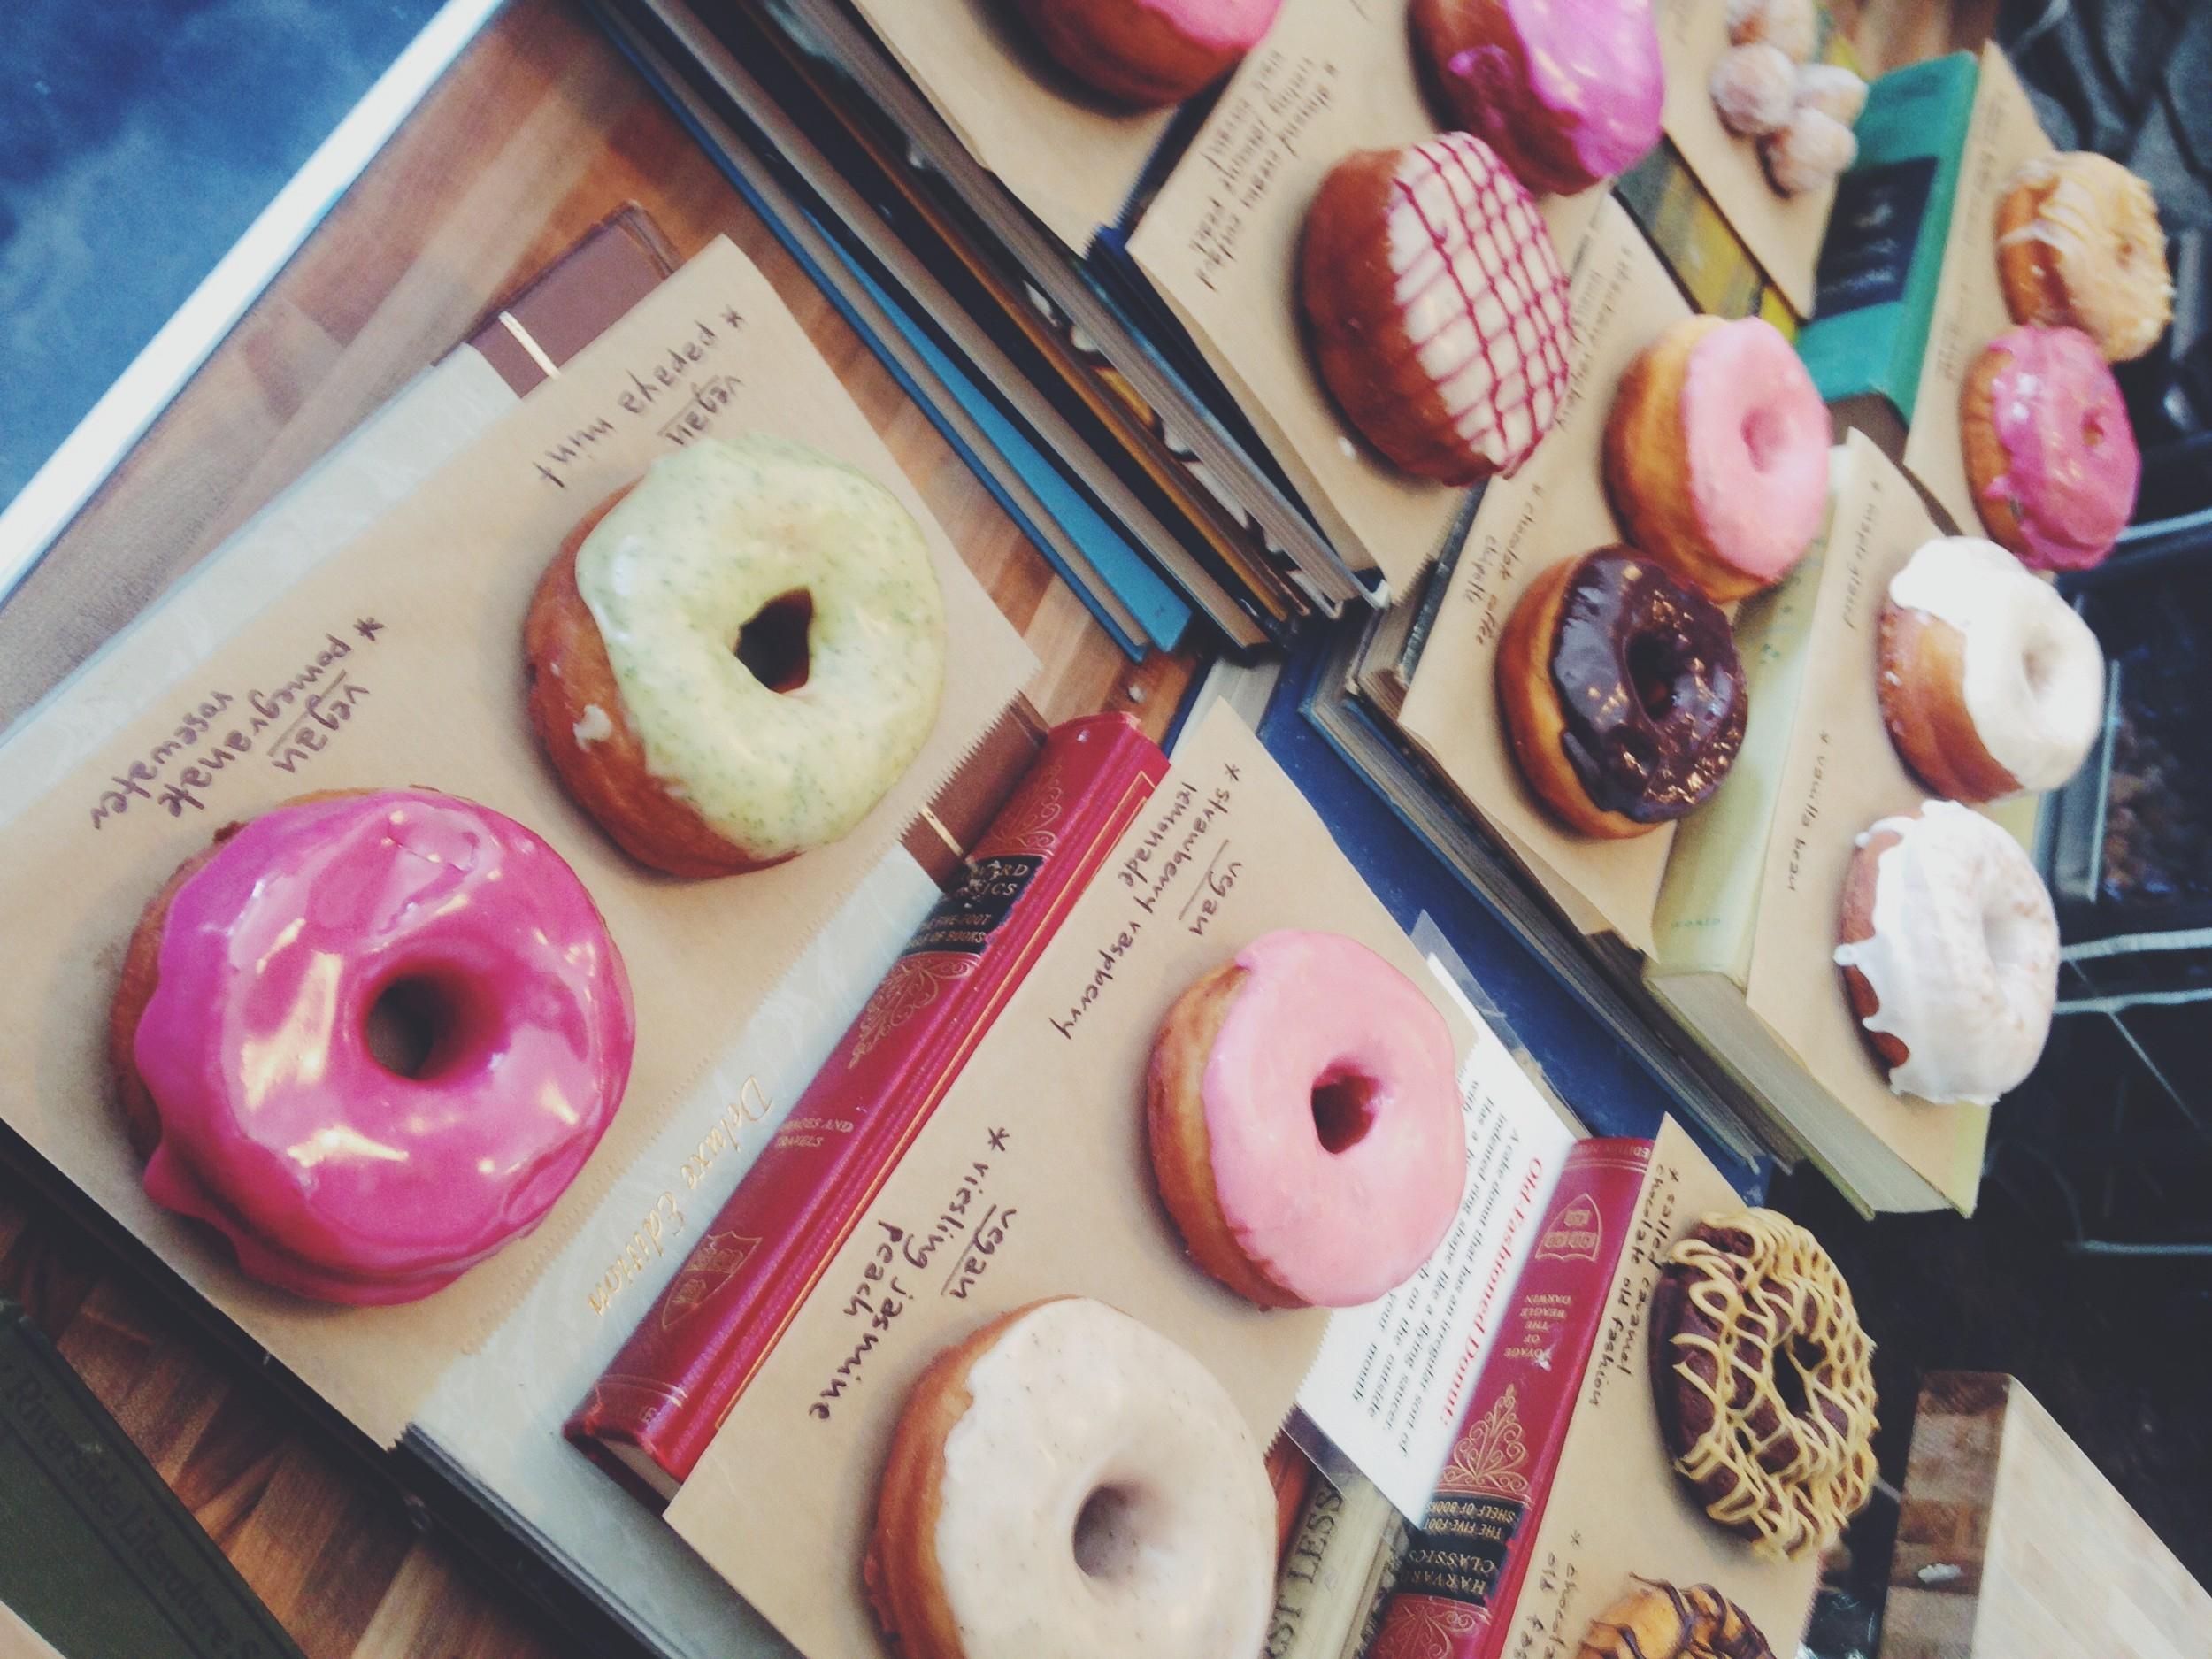 Donuts-on-Books-e1428381335694.jpg